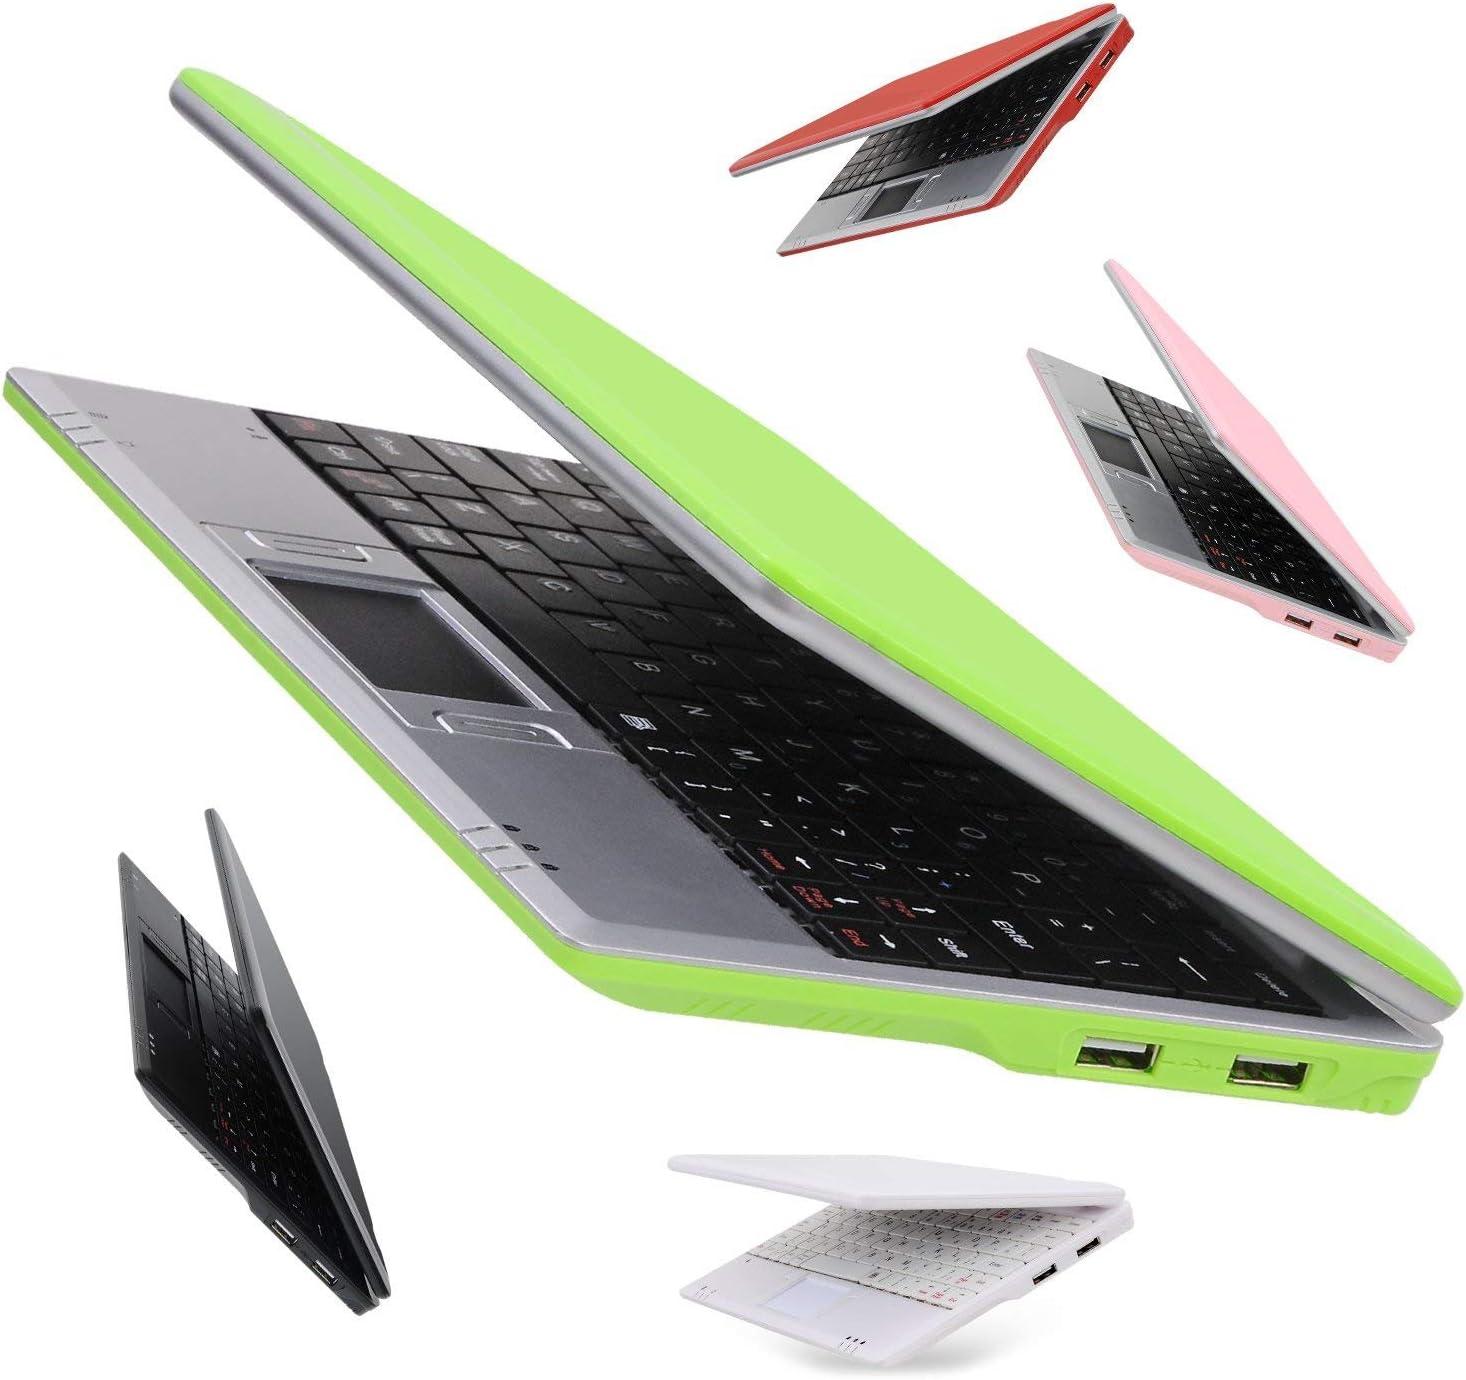 Mini Laptop 4 Gb 7 Zoll Netbook Android Computer Zubehör